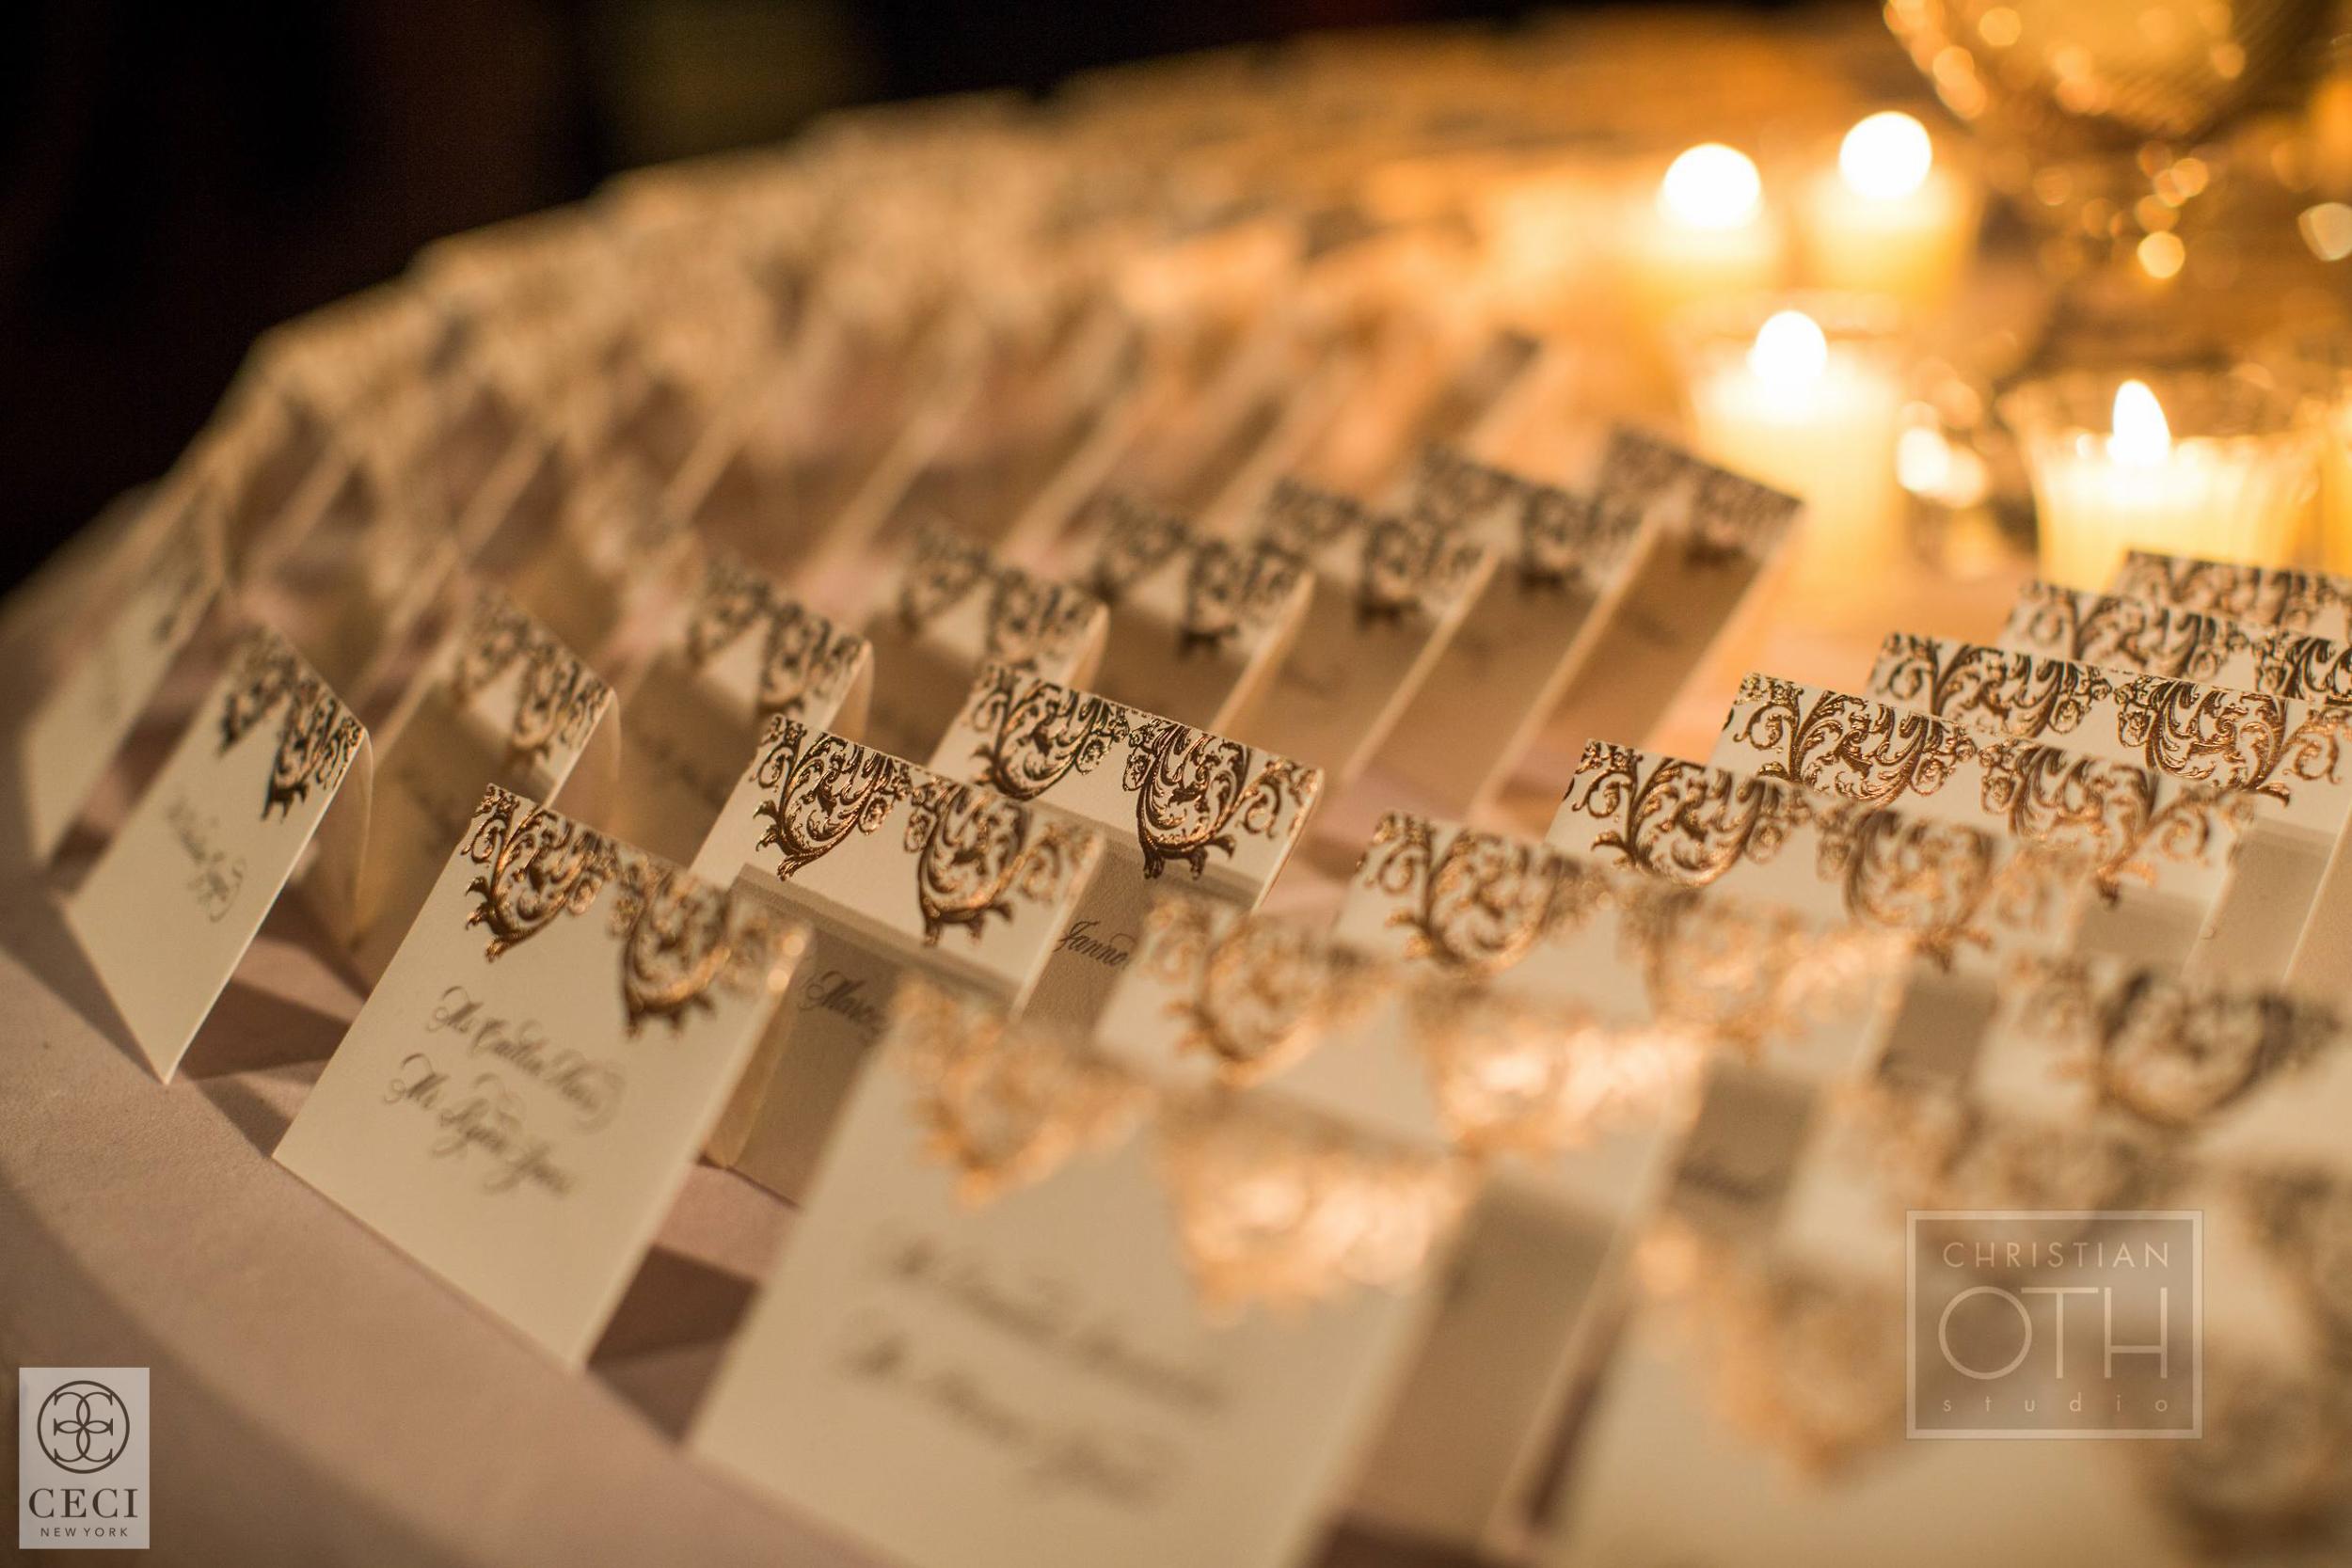 Ceci_New_York_Christian_Oth_CeciStyle_Pierre_New_York_City_Wedding_Luxury_Custom_Invitations_Personalized_Rose_Gold_Blush_Bride_-4.jpg